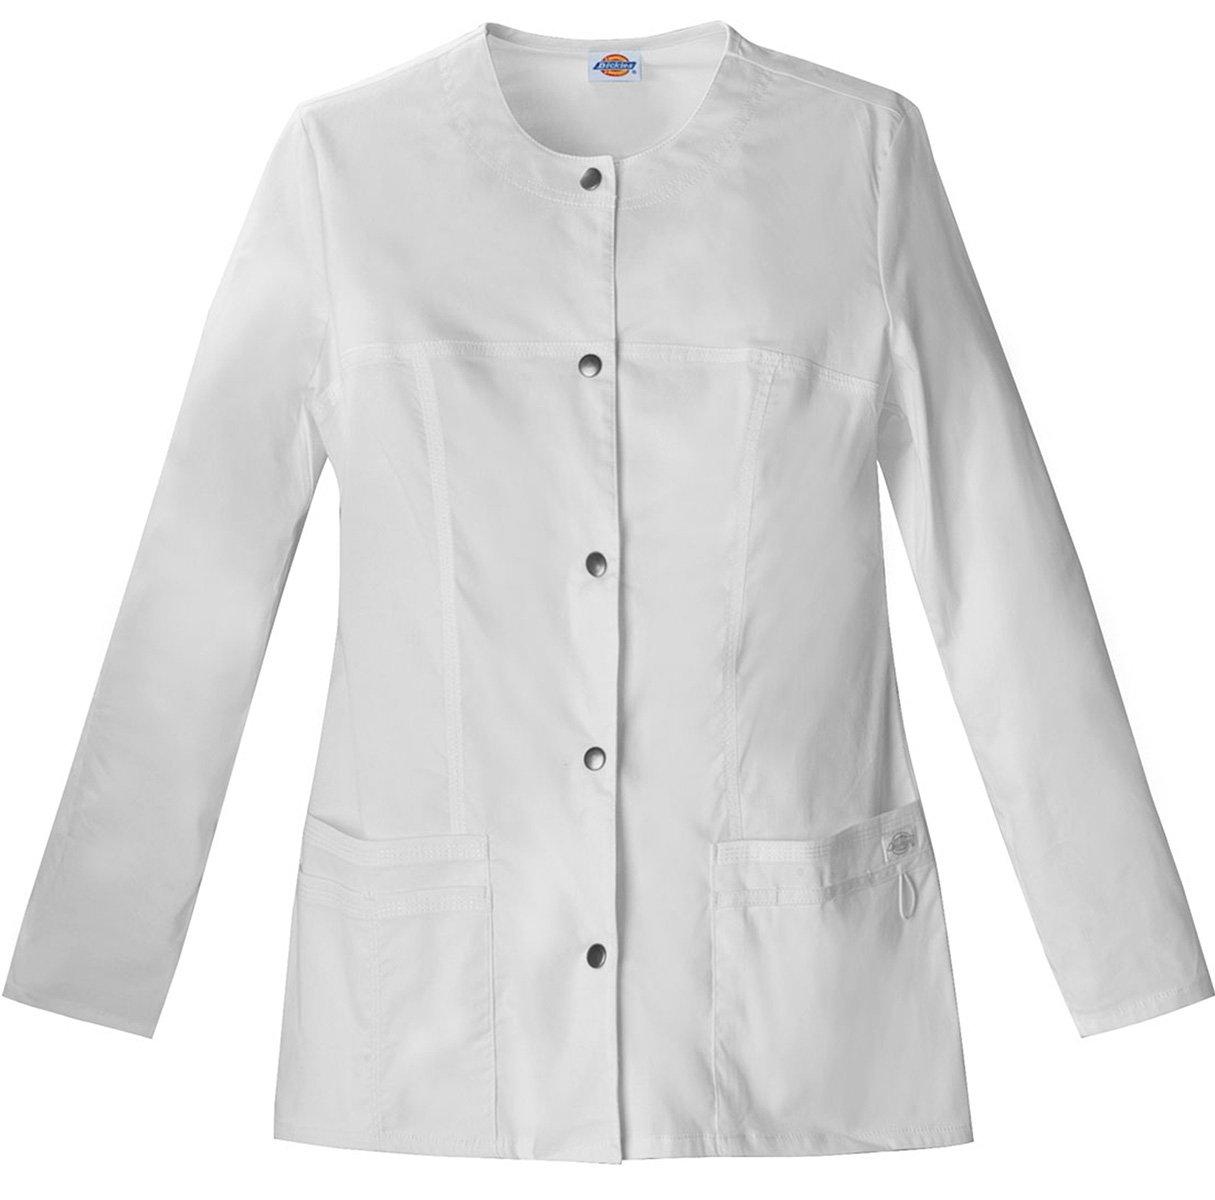 Dickies Women's Snap Front Warm-Up Jacket_White_Medium,82409